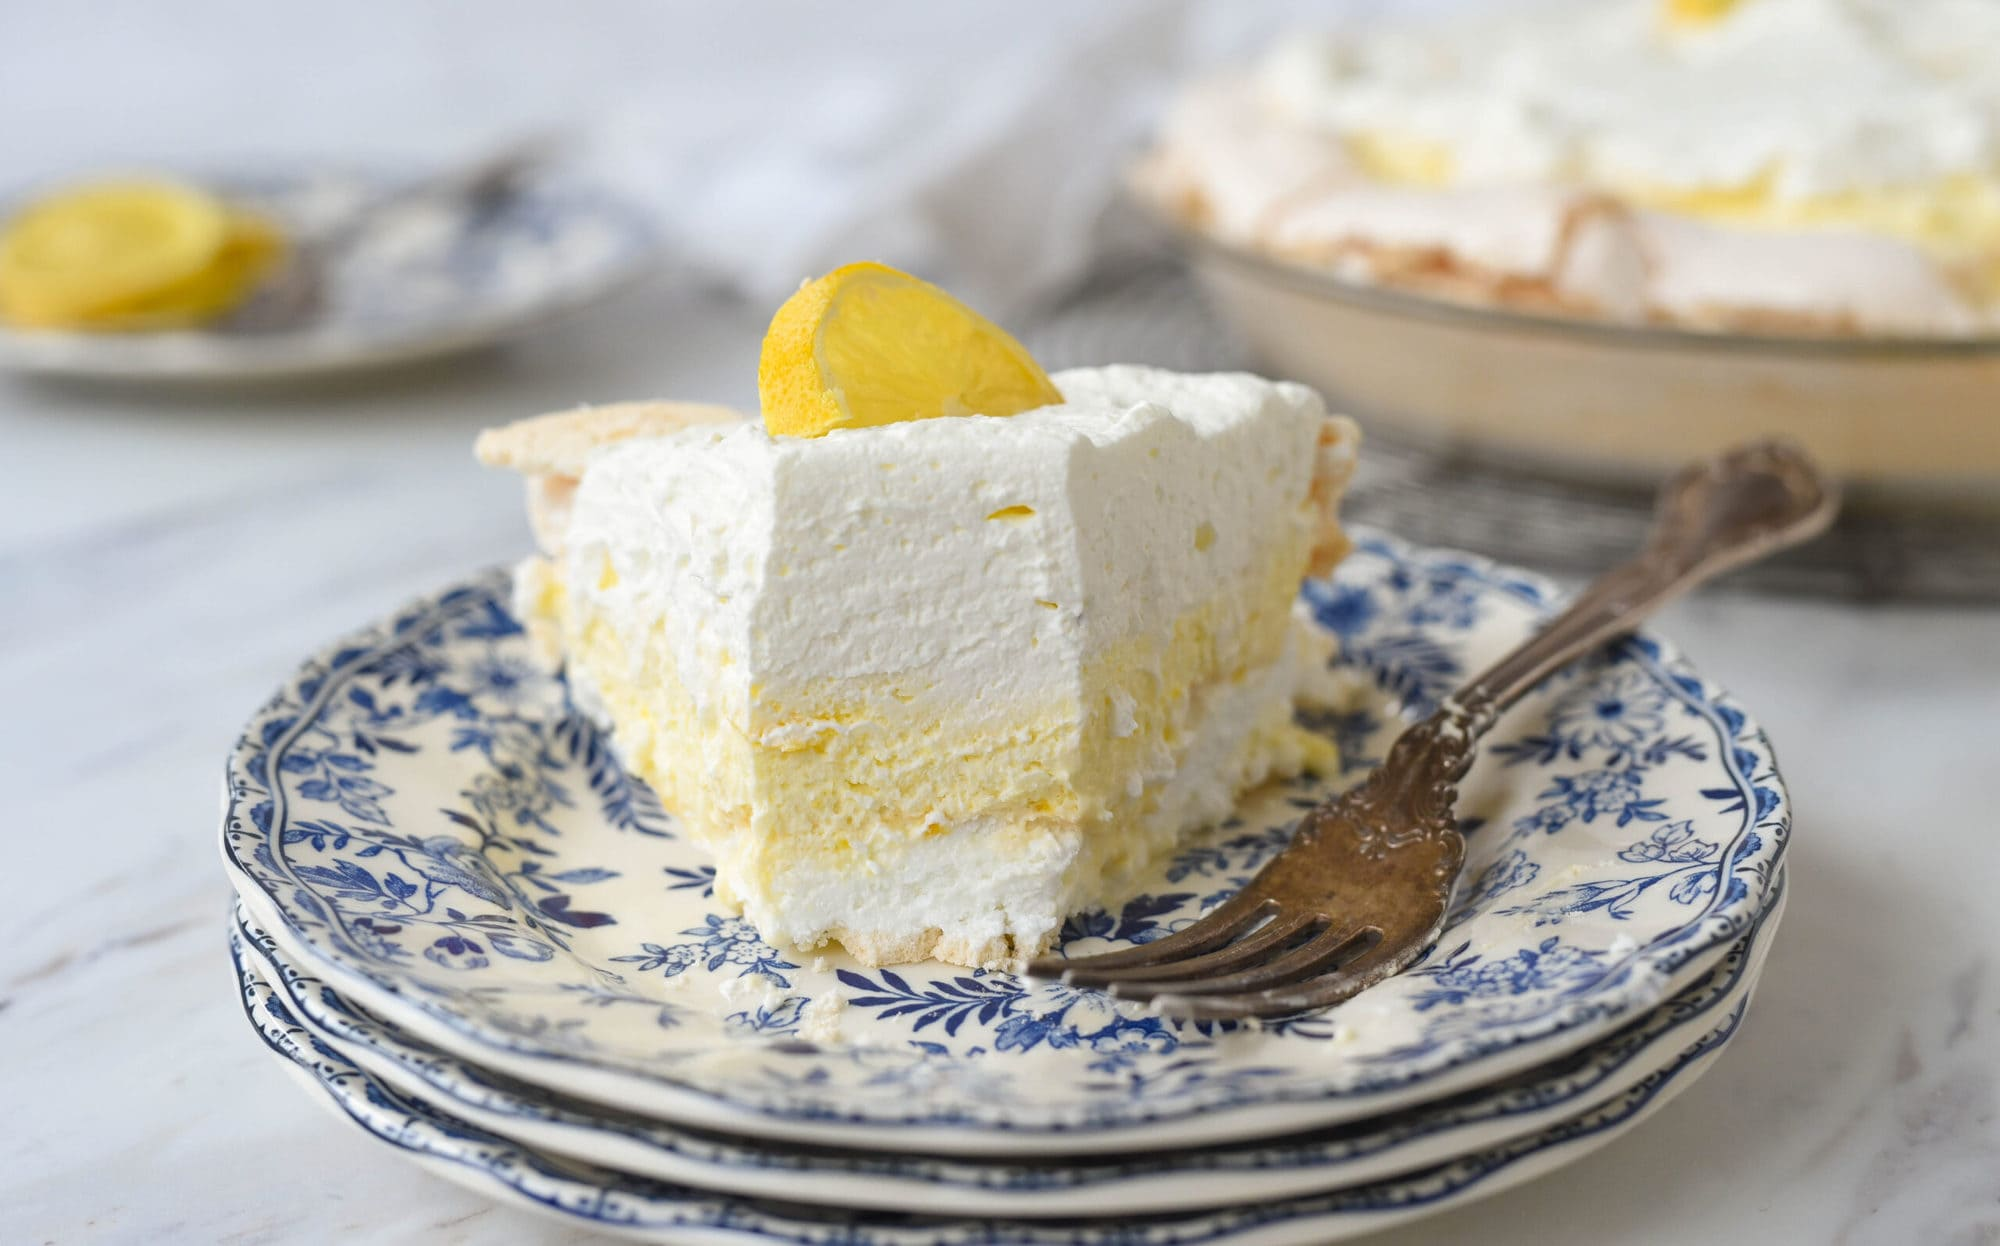 slice of lemon pie